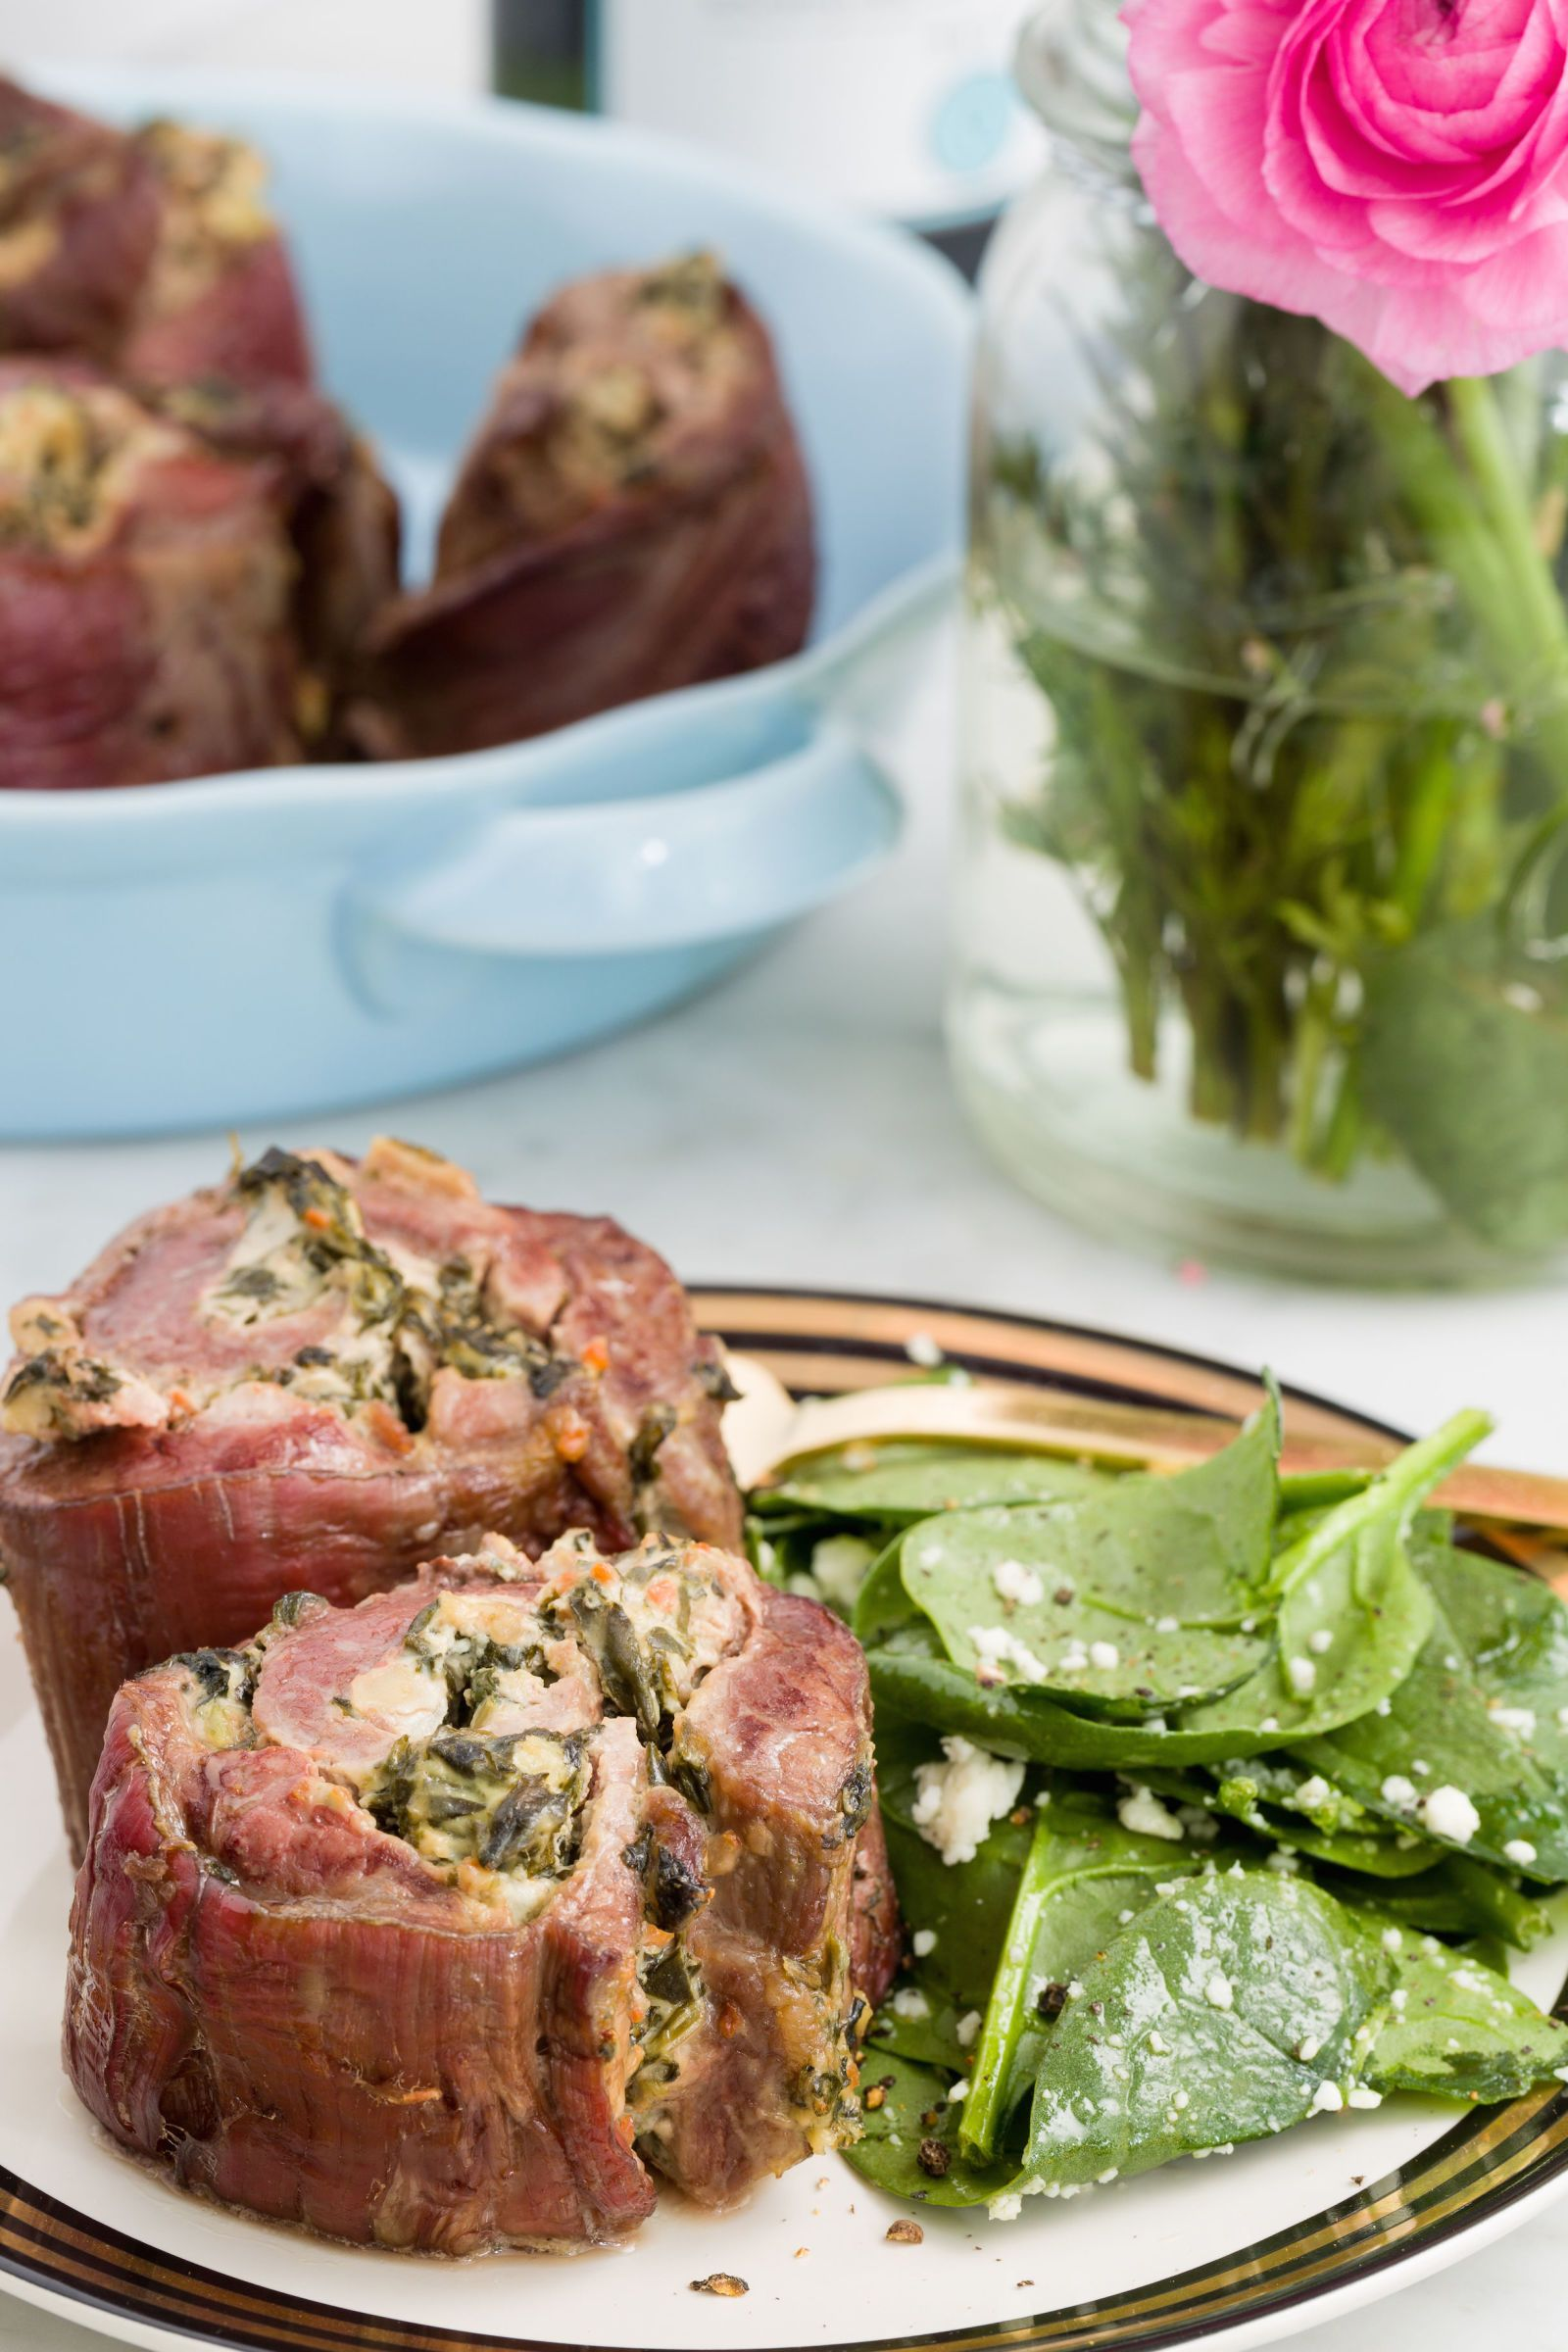 Exceptional Spinach And Artichoke Steak Roll Ups   Delish.com · Romantic Dinner For TwoRomantic  DinnersRomantic Dinner RecipesSteak ...